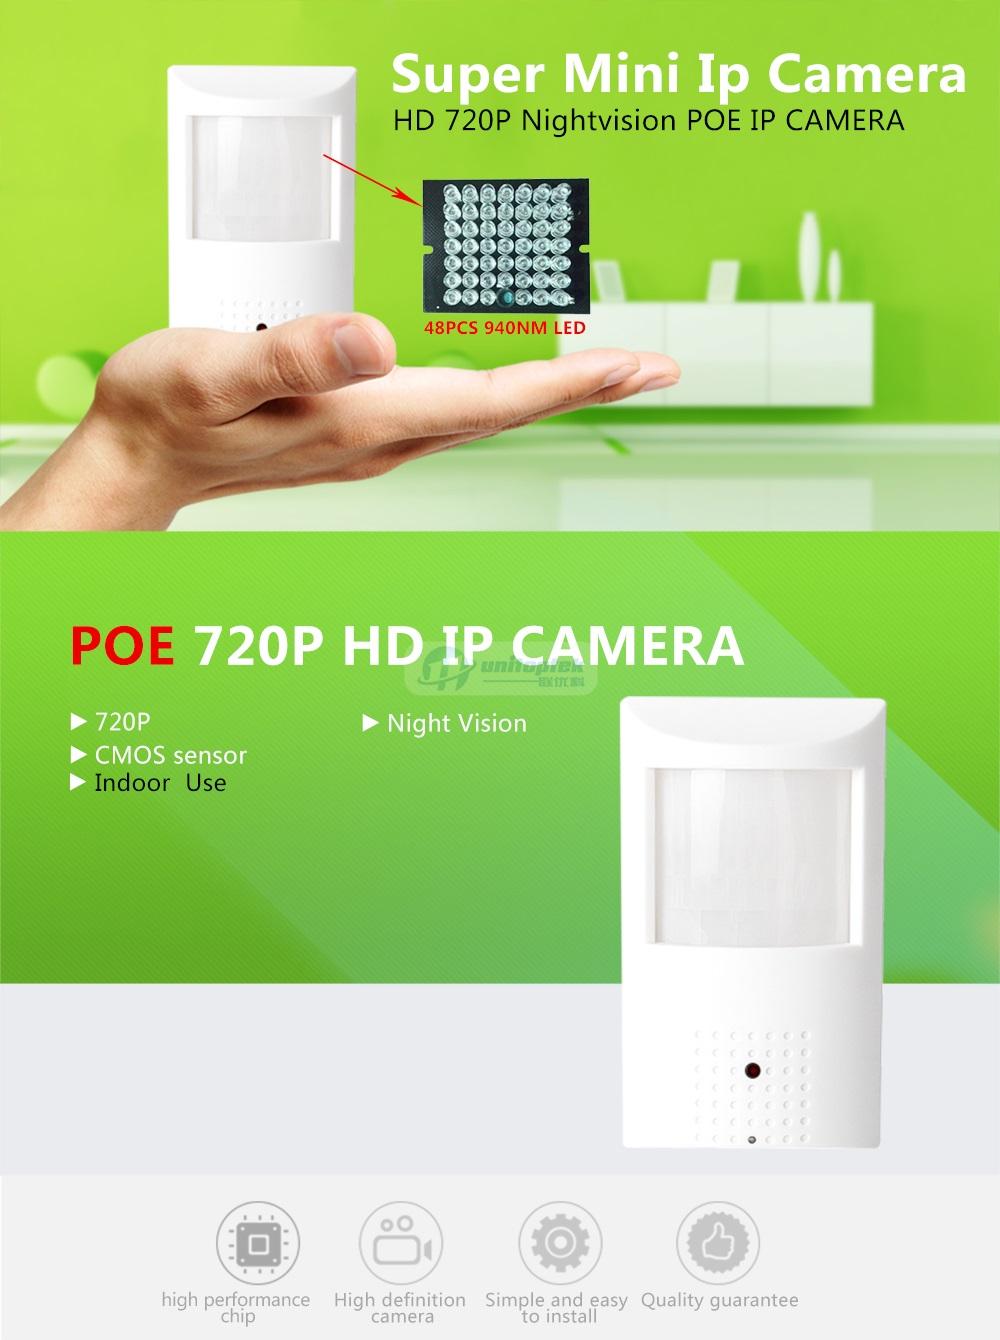 IPCX-MC40272N-P_01